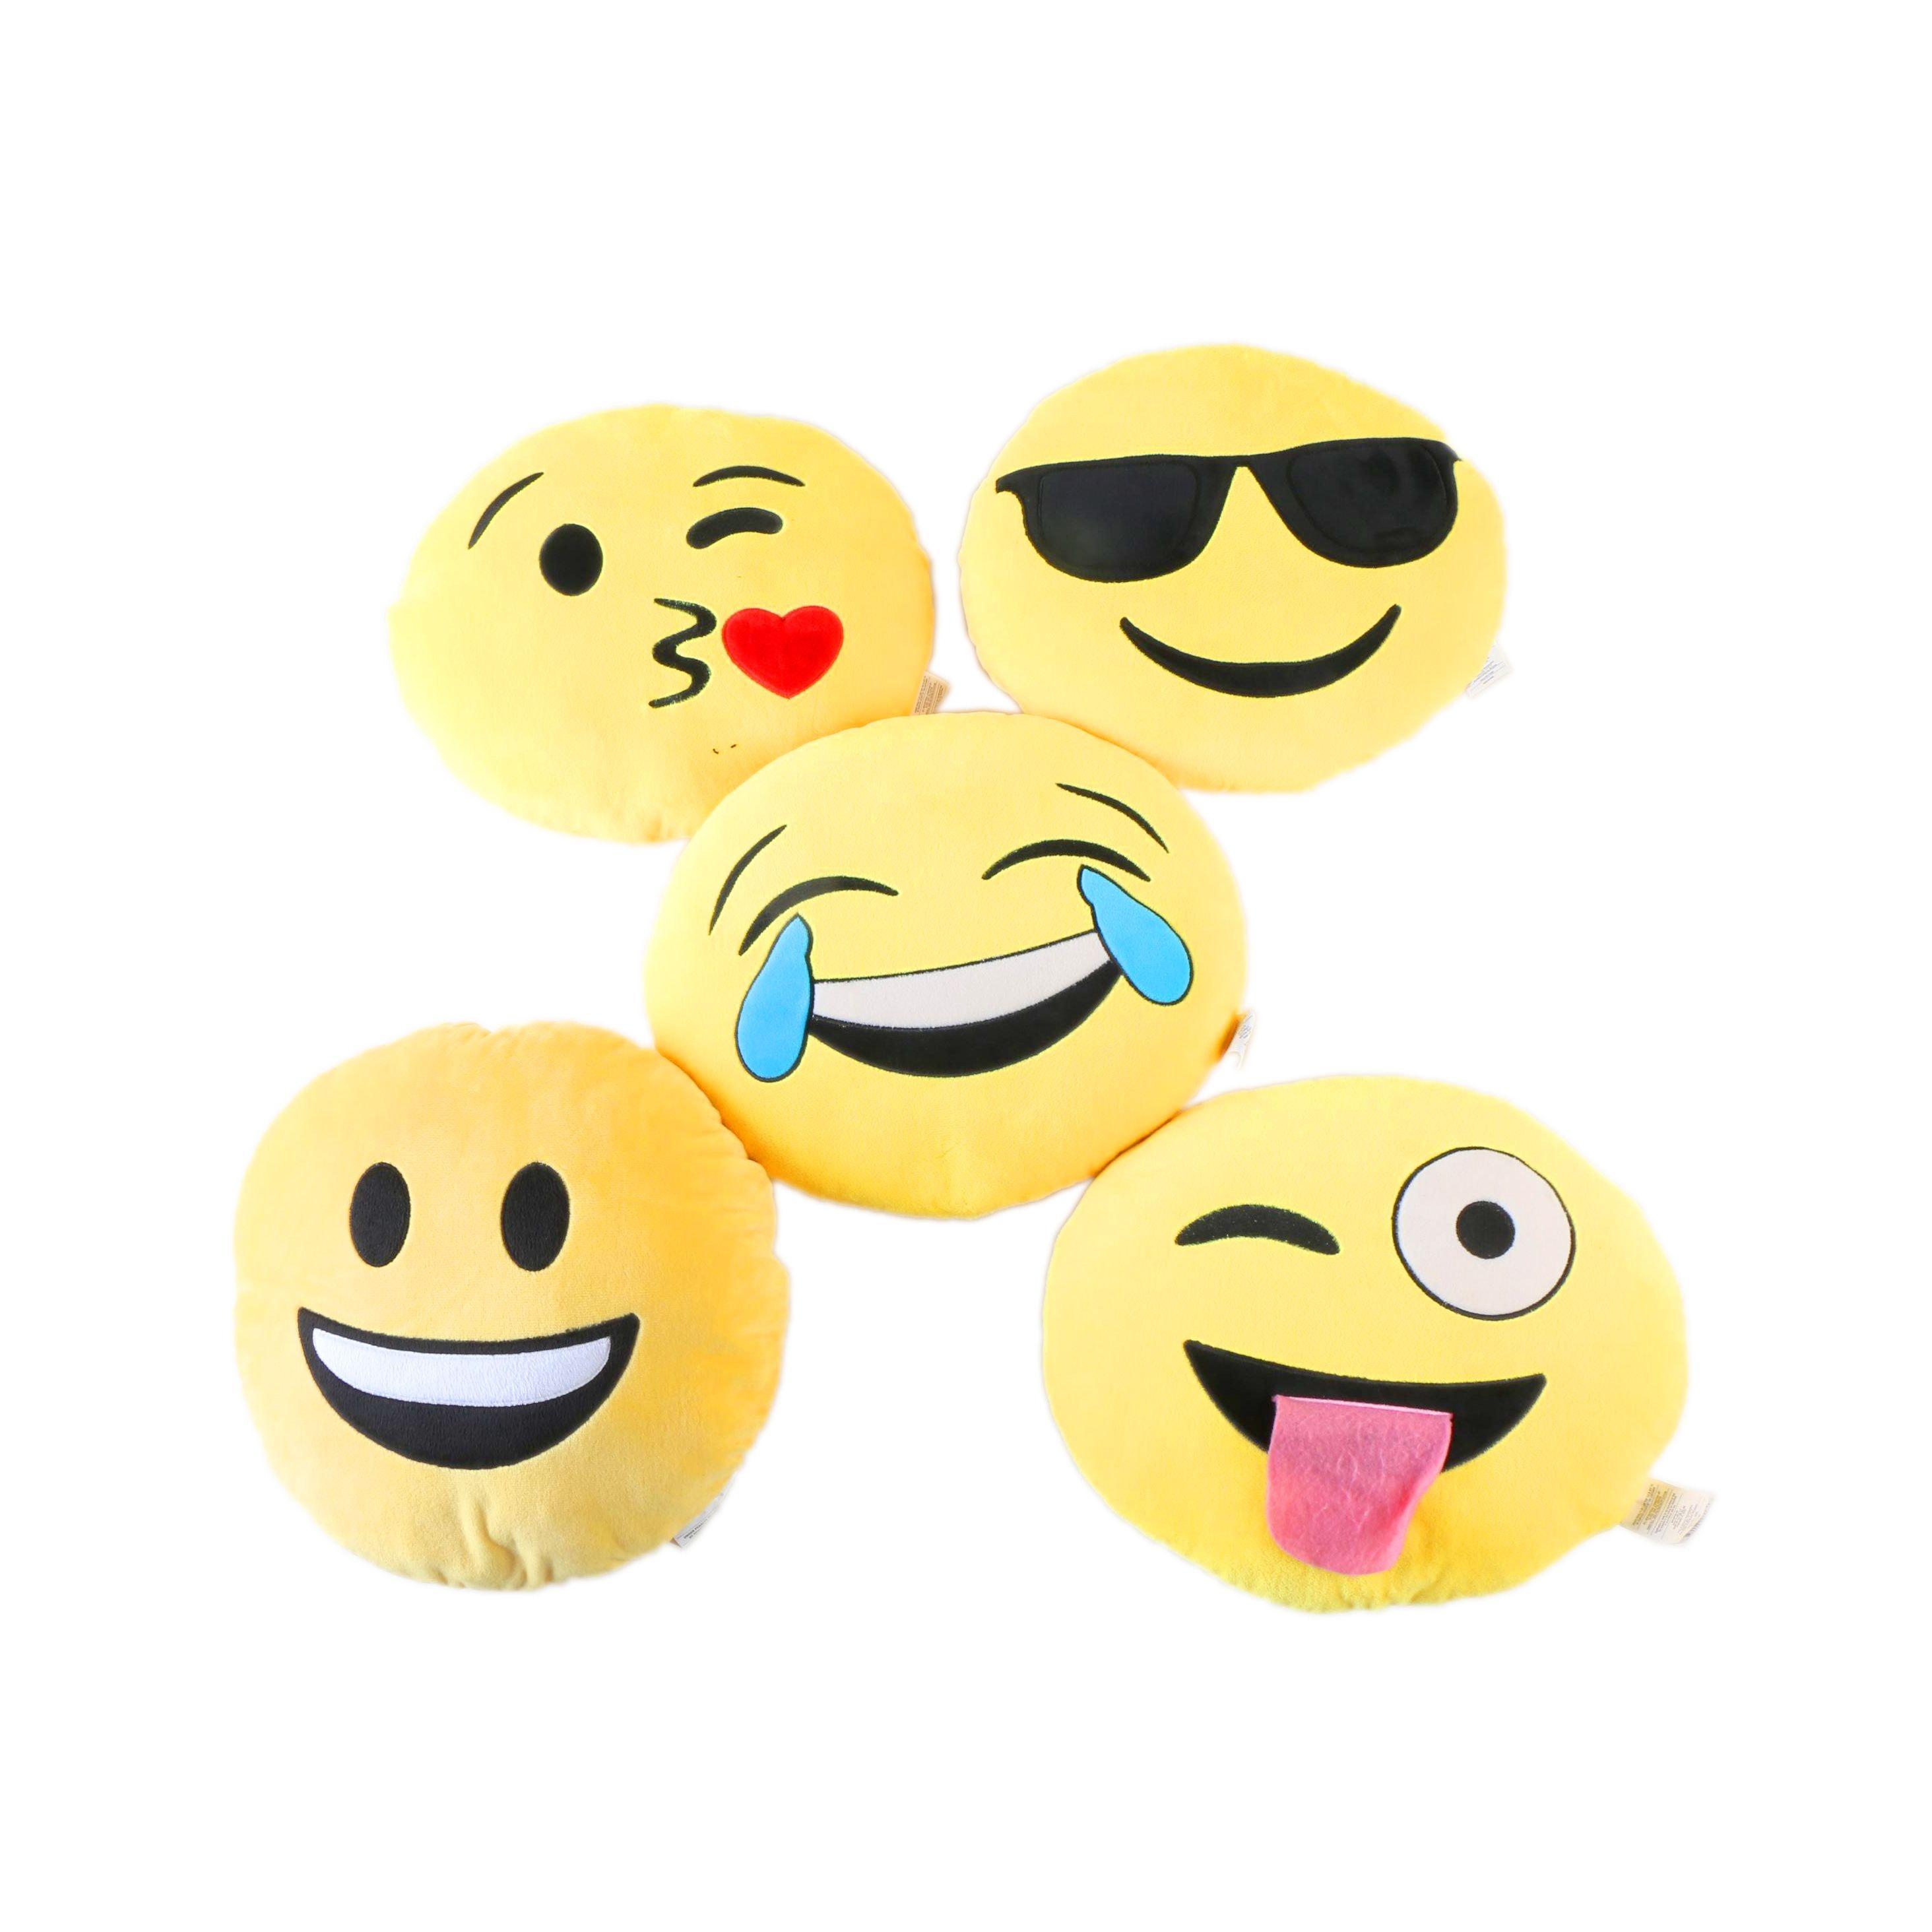 Emoji Themed Throw Pillows